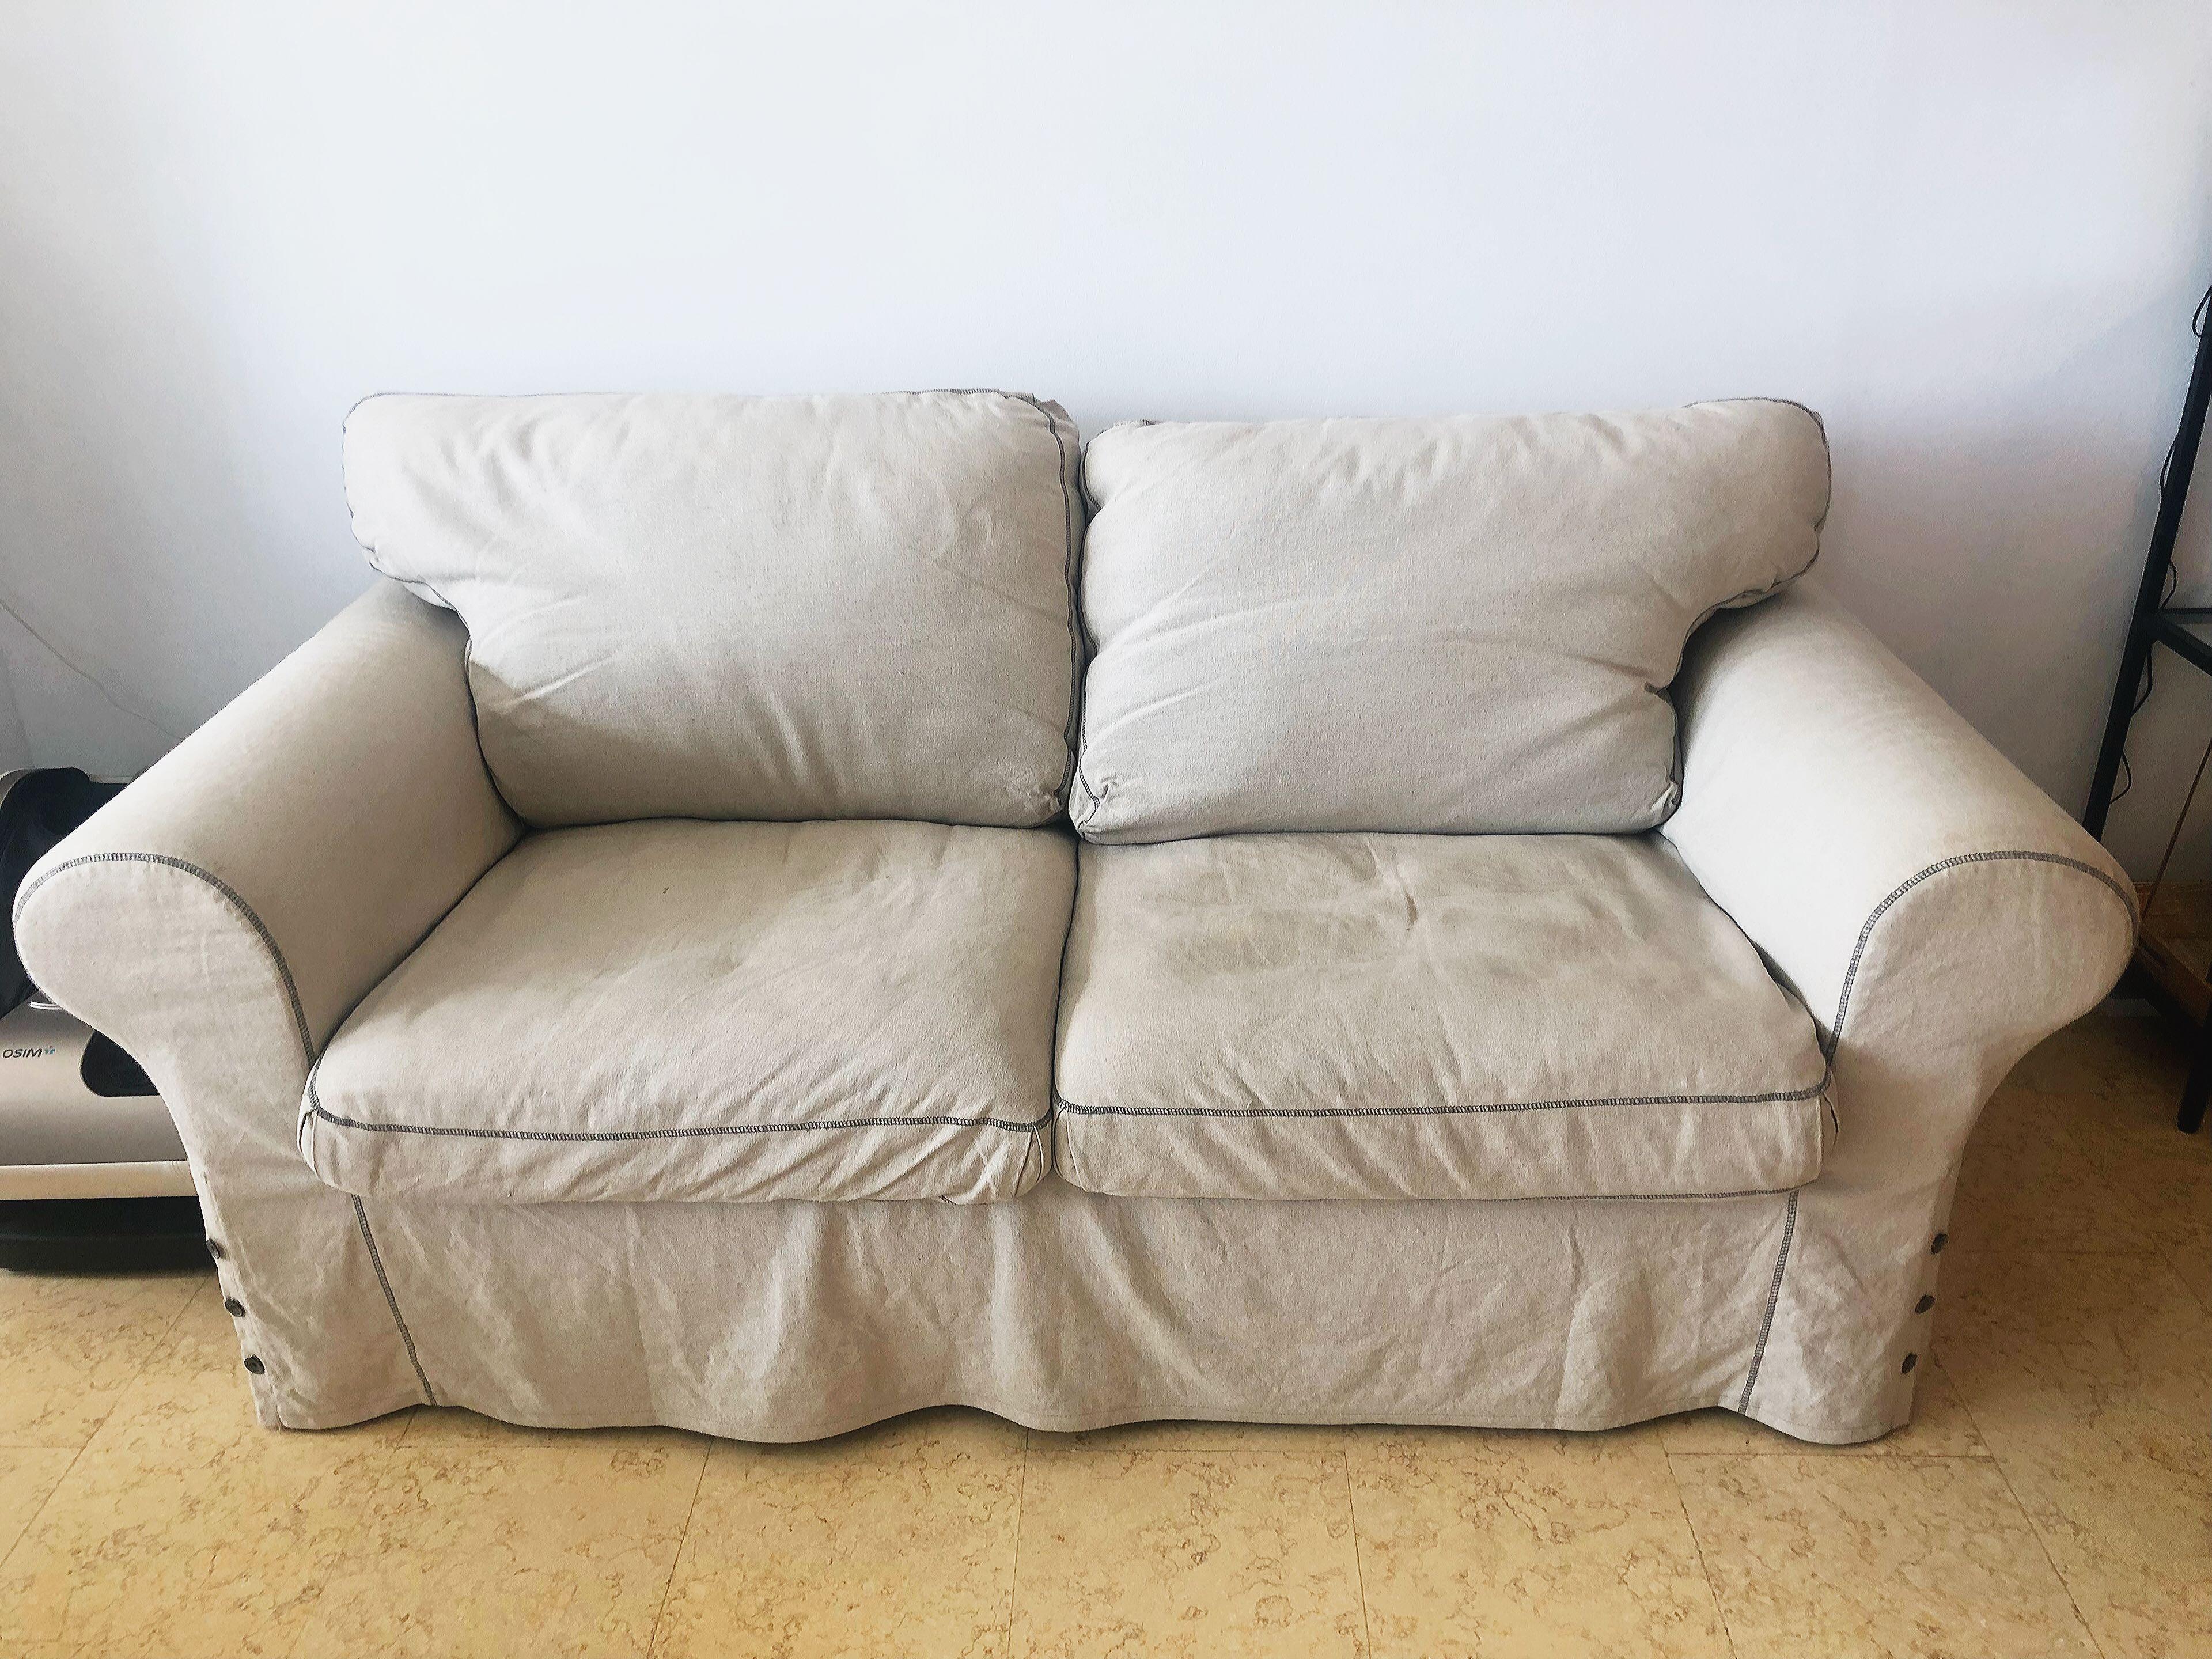 Ikea Ektorp 2 Seater Sofa With 2 Extra Set Of Covers Furniture